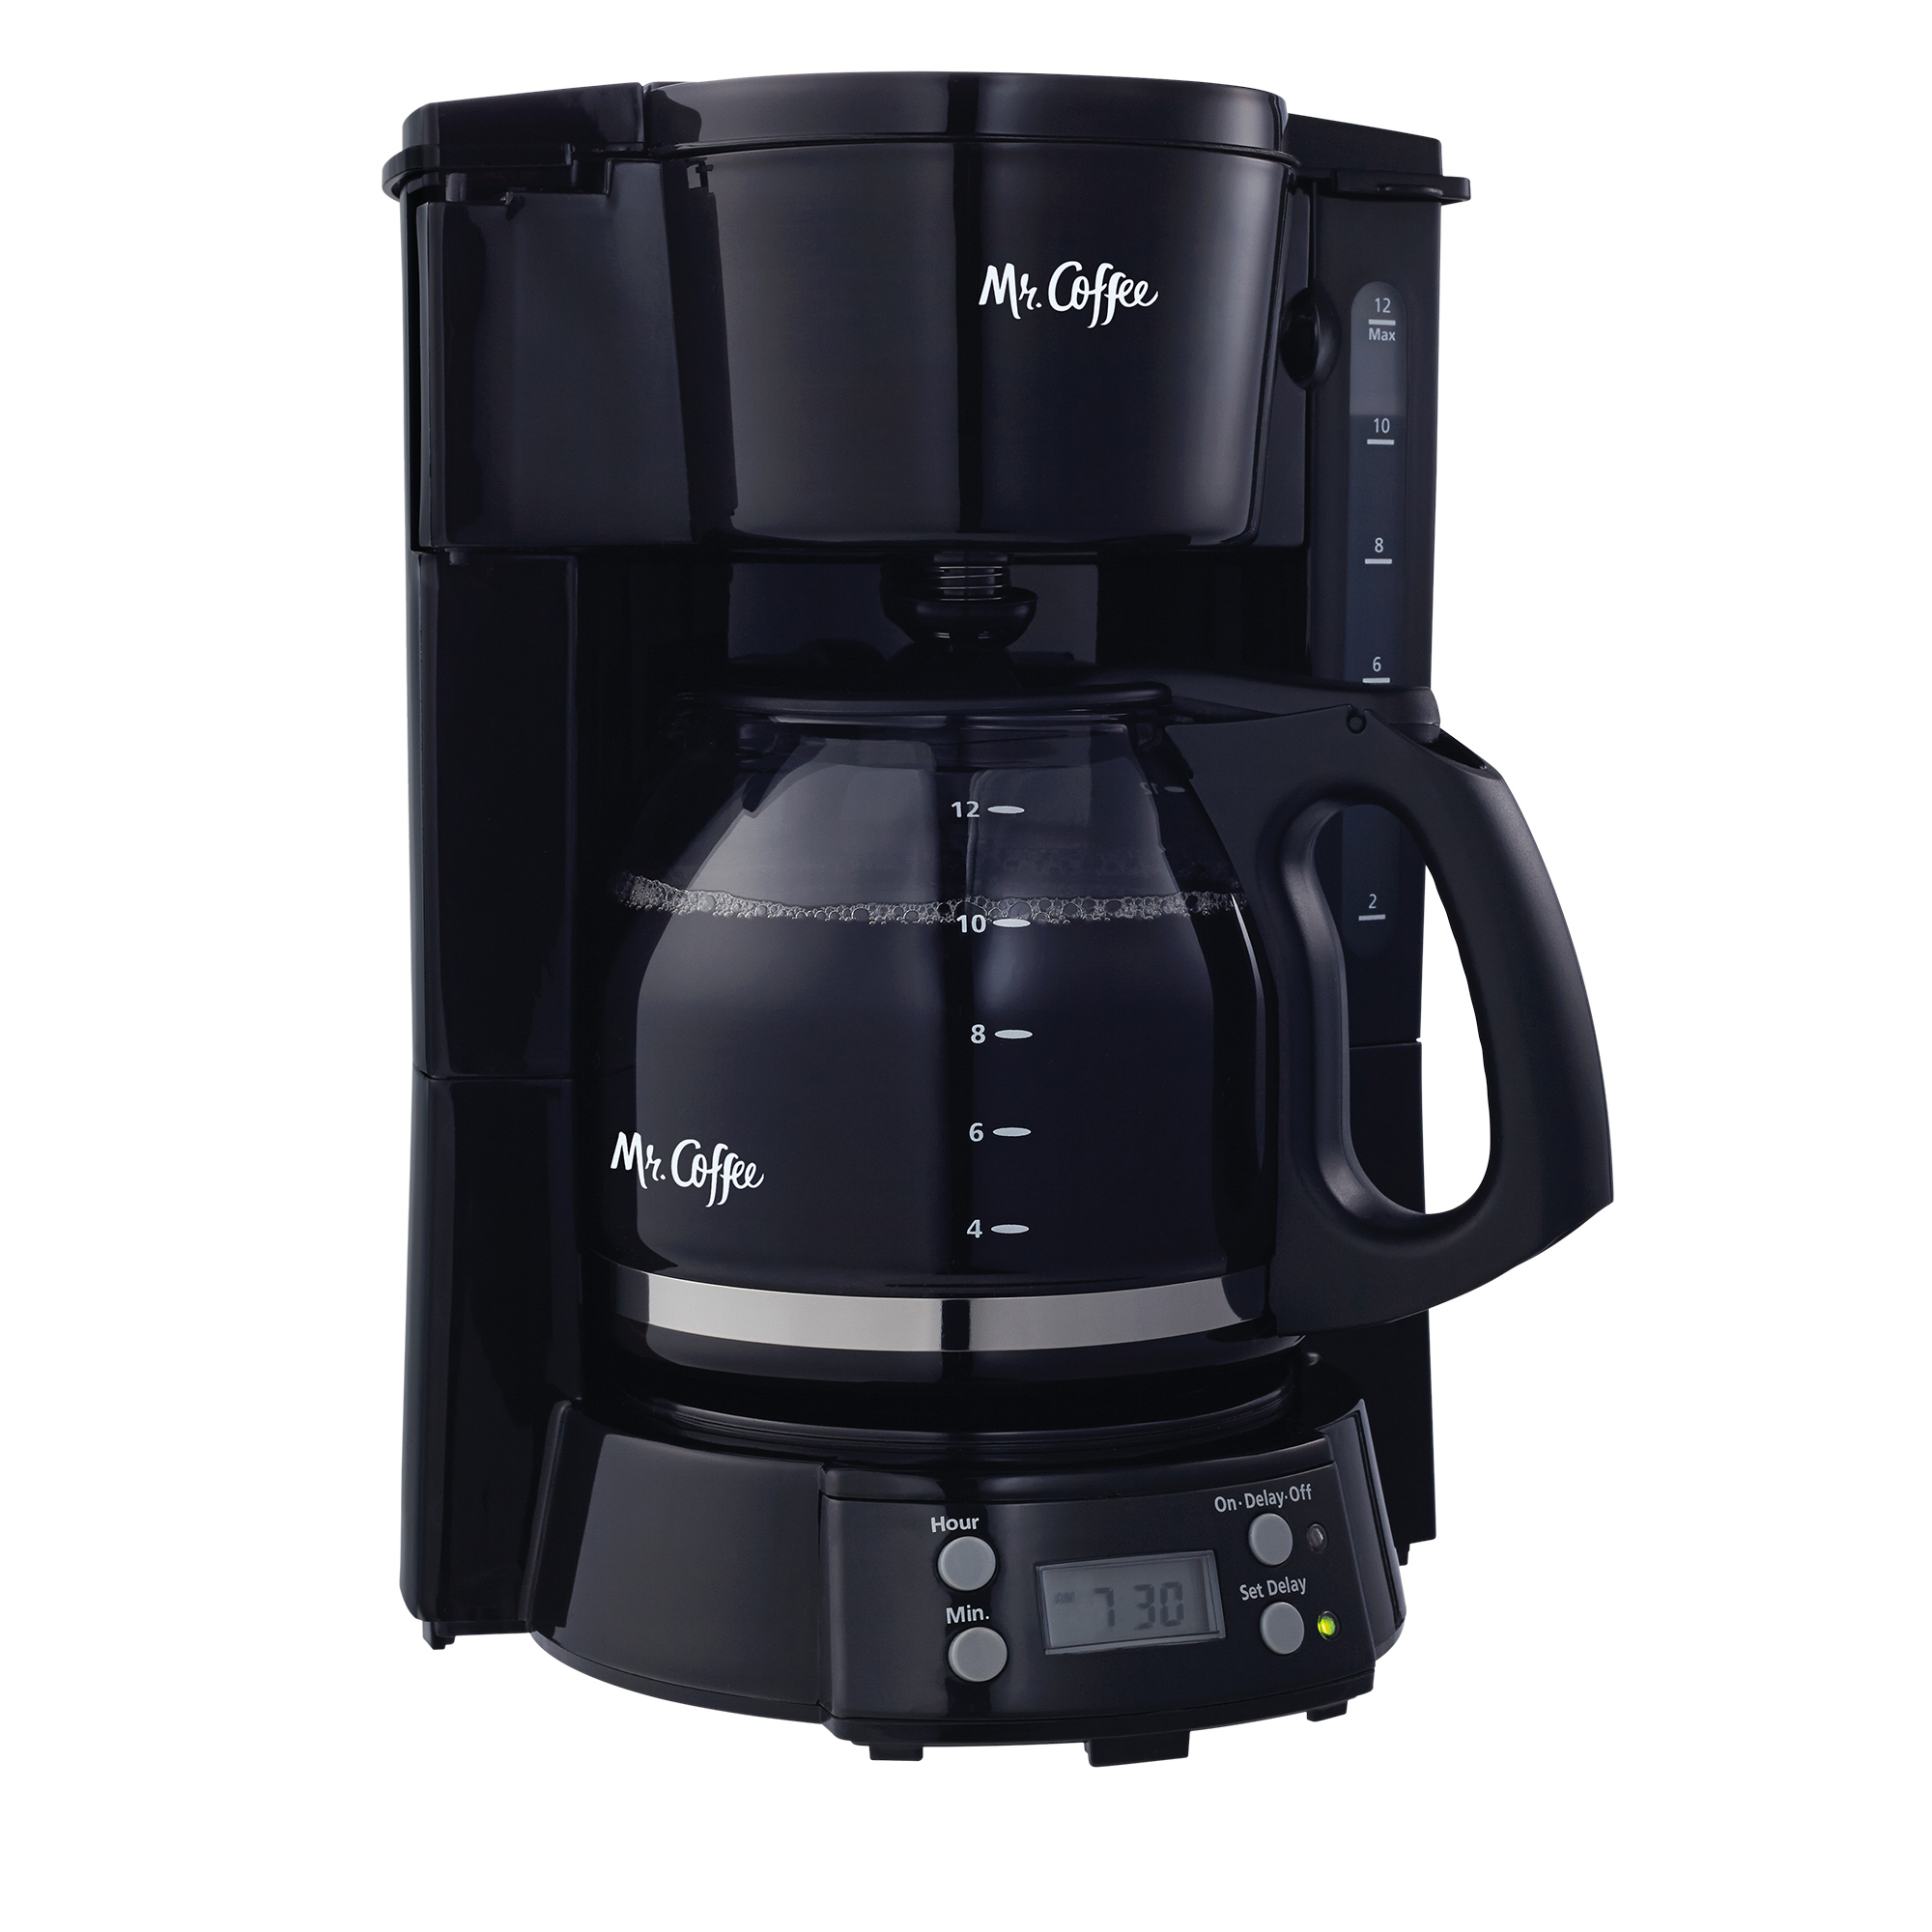 Mr. Coffee 12-Cup Programmable Coffee Maker, Black (BVMC-EVX23)